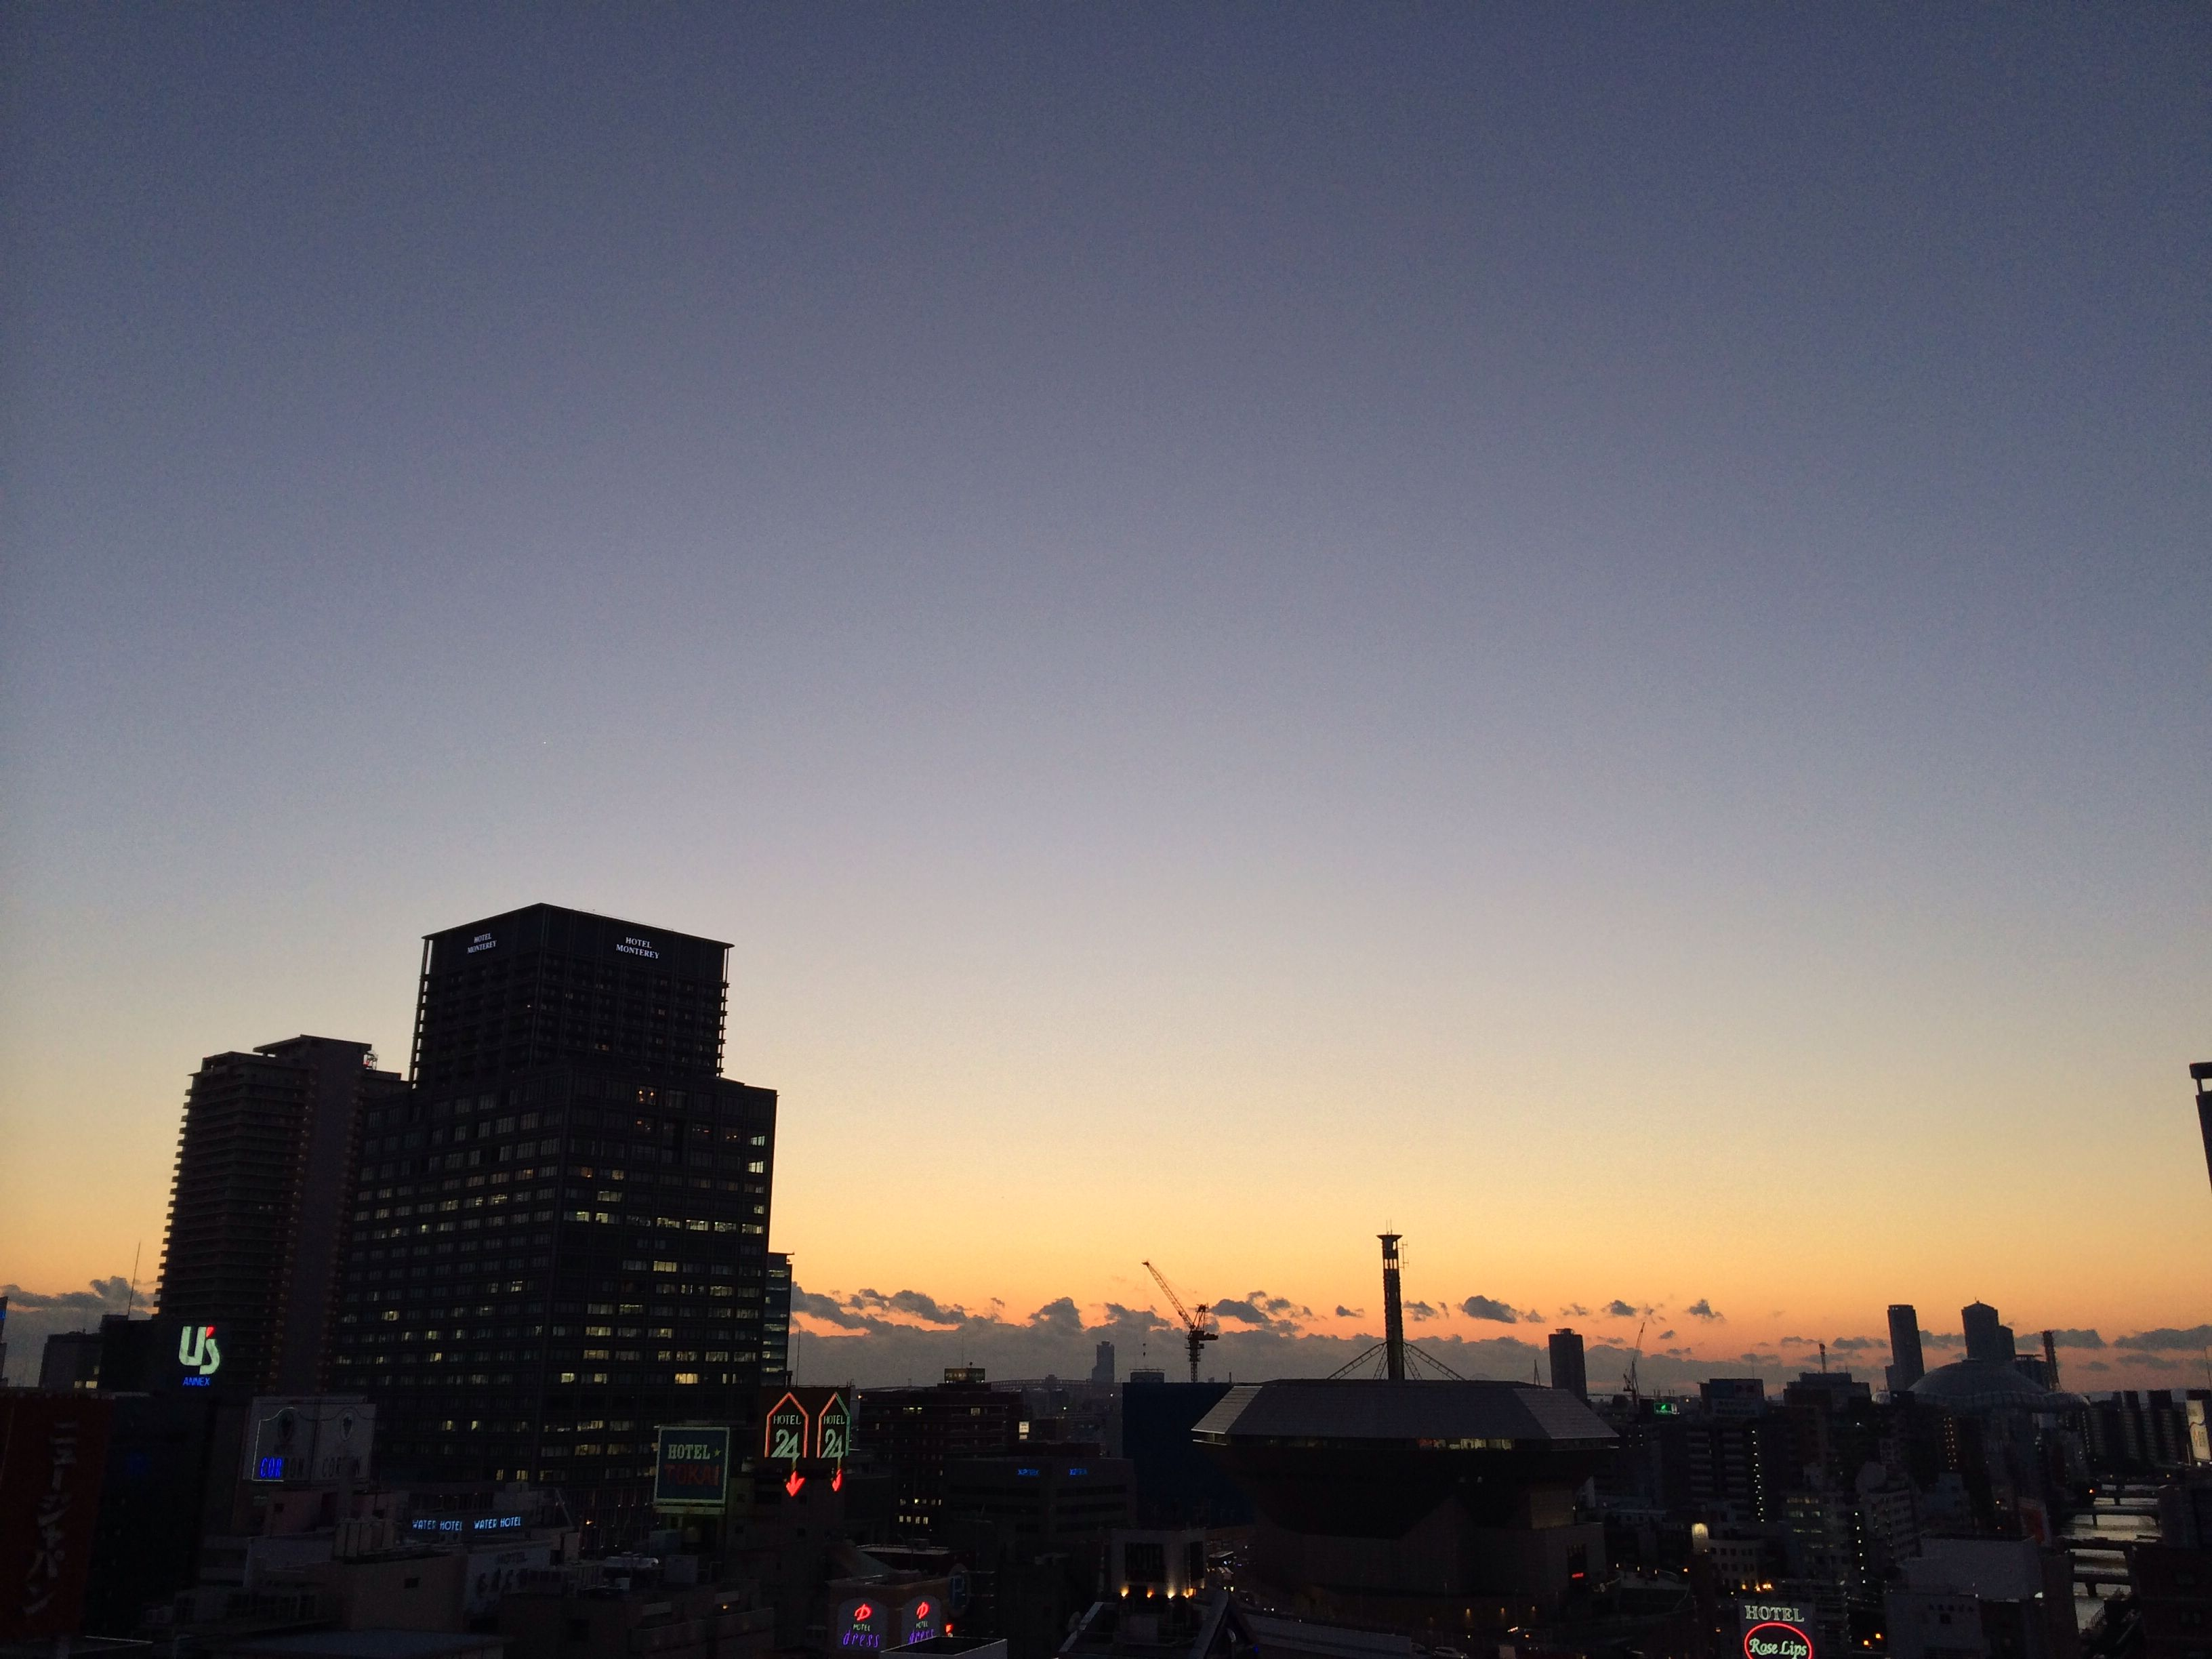 Sunset time of Christmas Eve